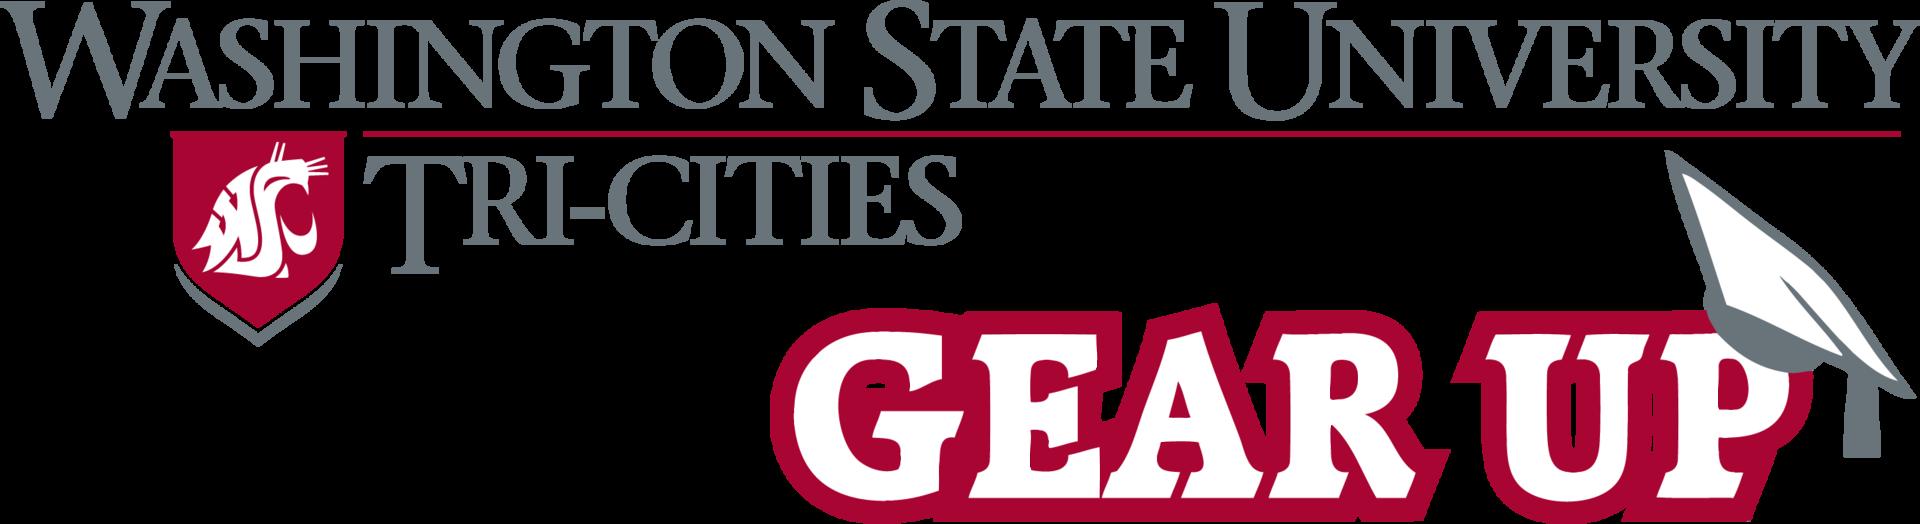 Washington State University Tri-Cities GEAR UP